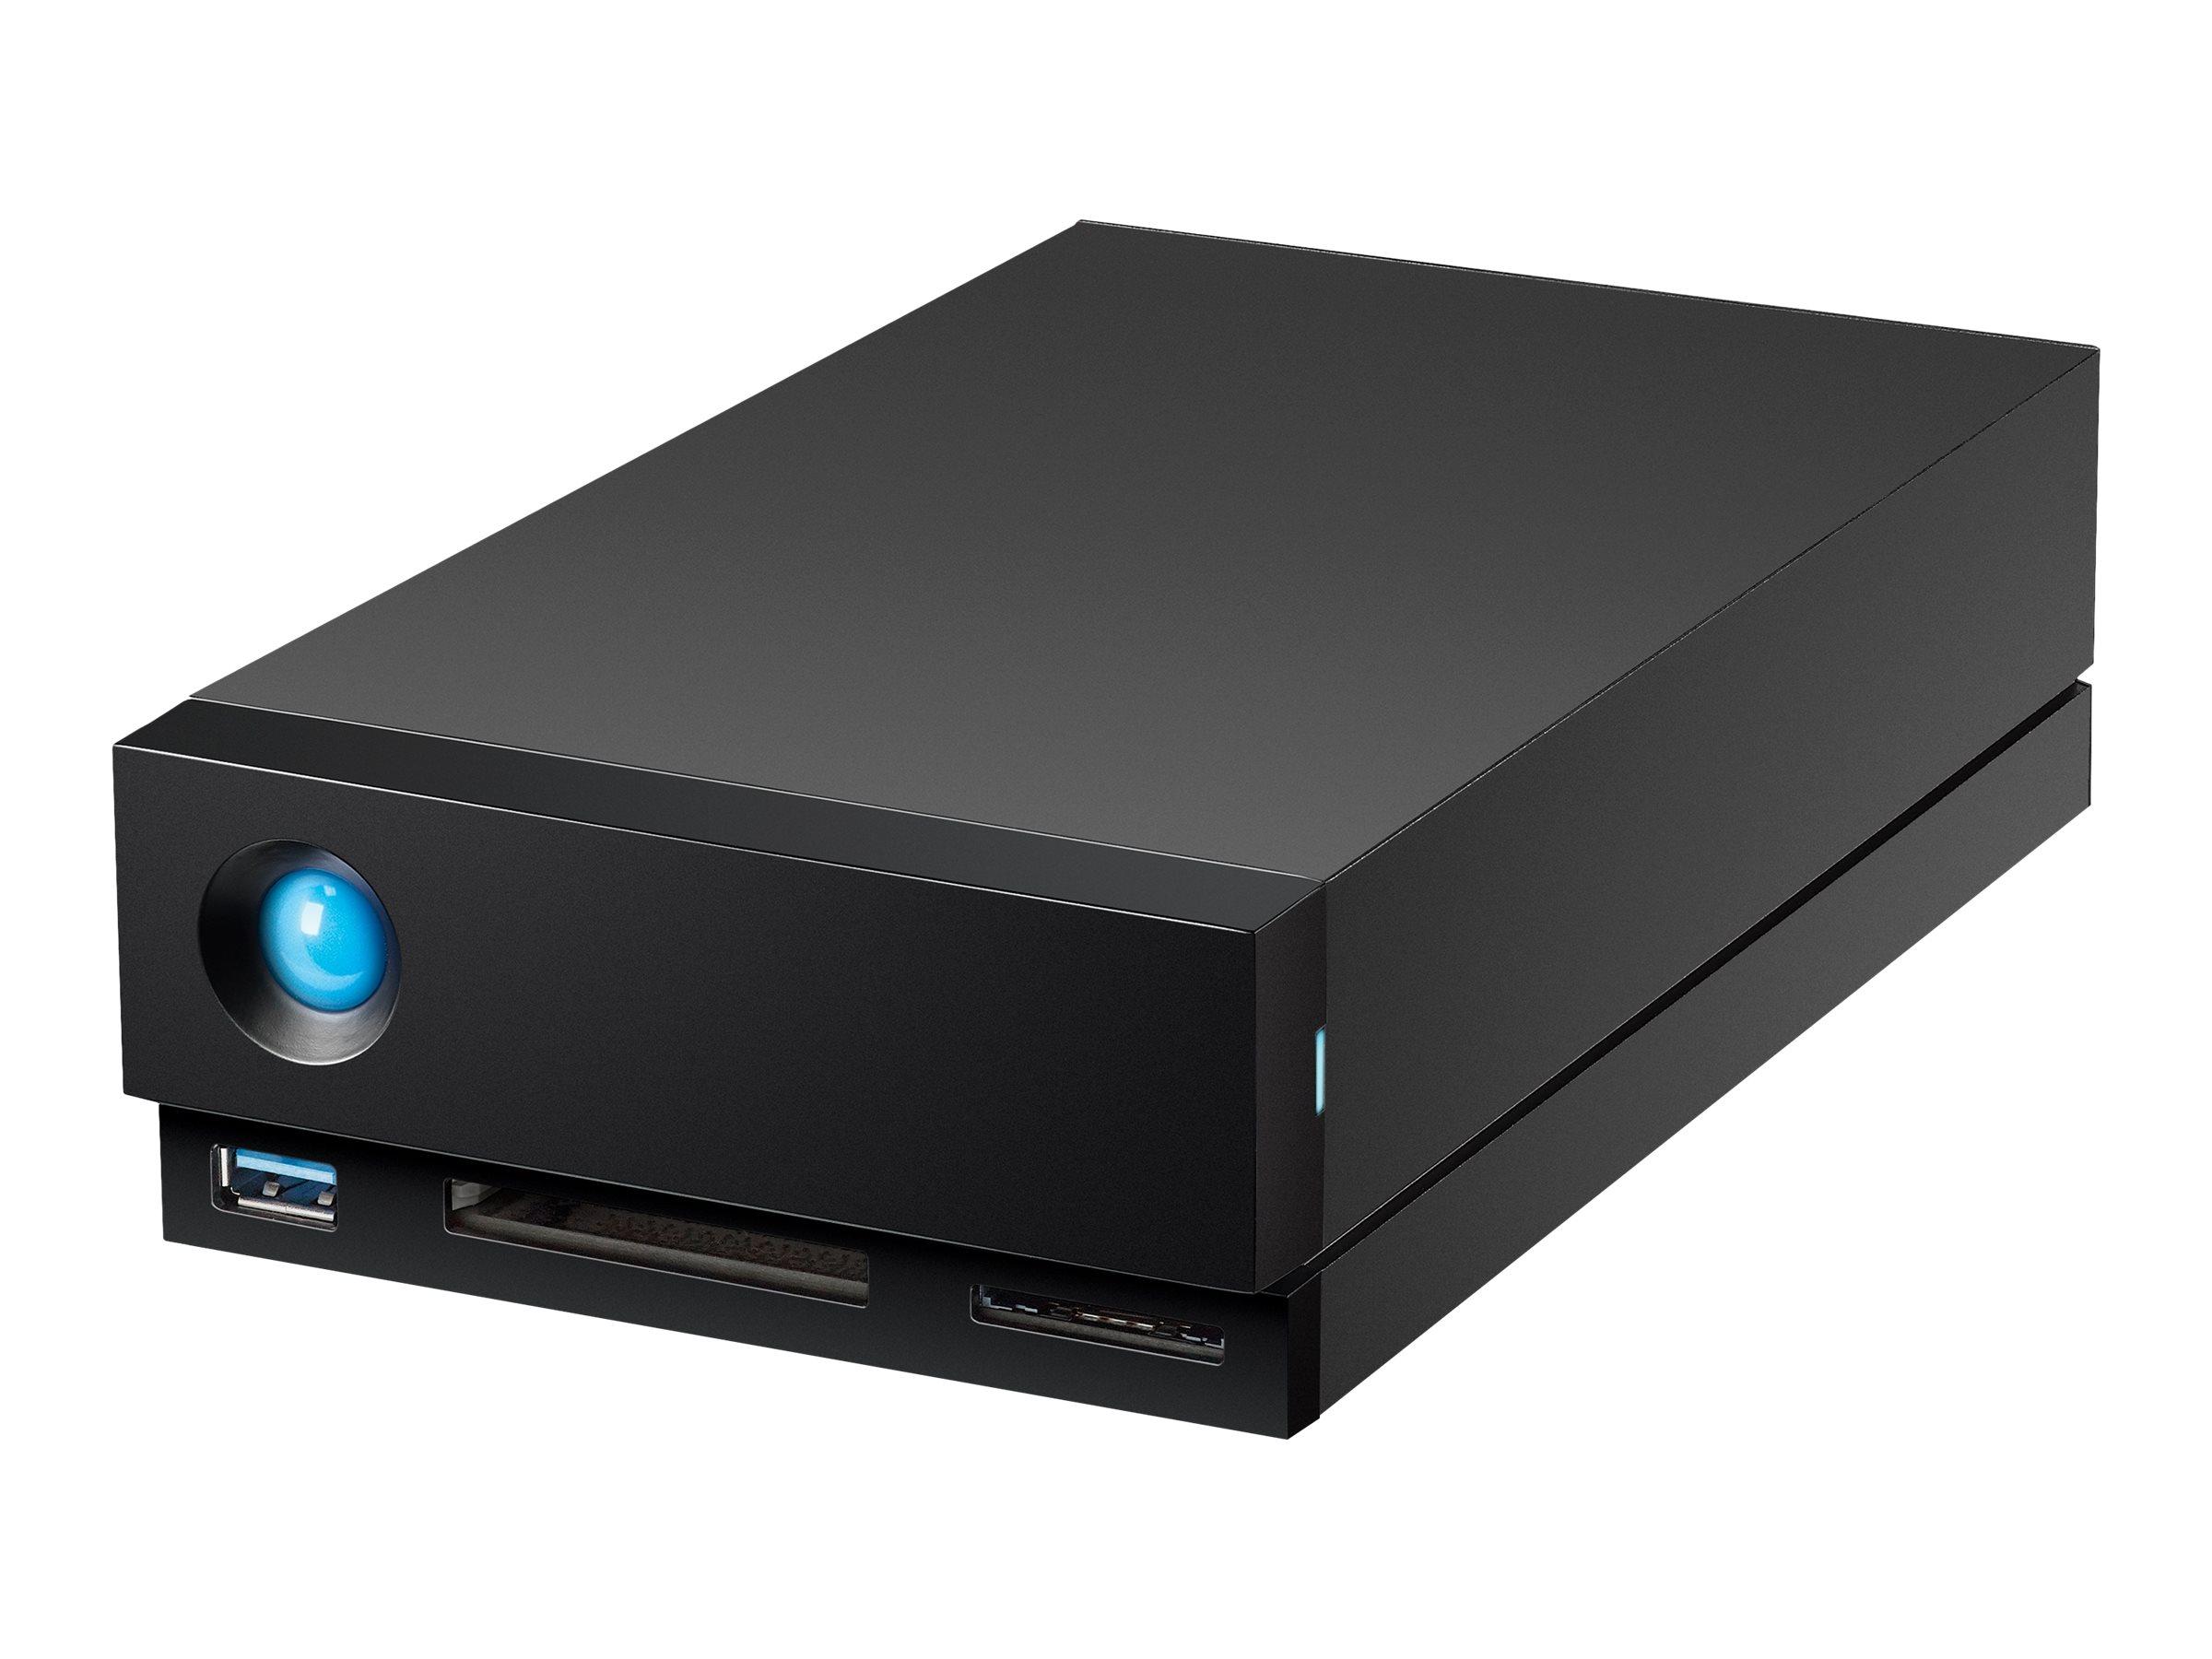 LaCie 1big Dock STHS16000800 - Festplatten-Array - 16 TB - 1 Schächte (SATA-600) - HDD 16 TB x 1 - USB 3.1, Thunderbolt 3 (exter